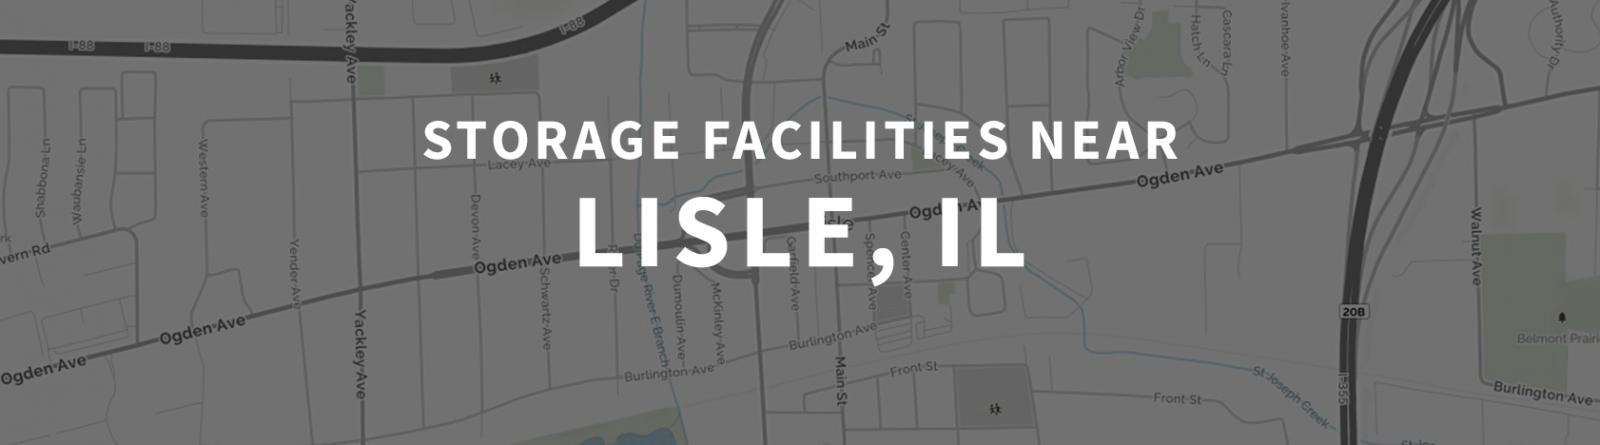 4 Storage Facilities Near Lisle, IL